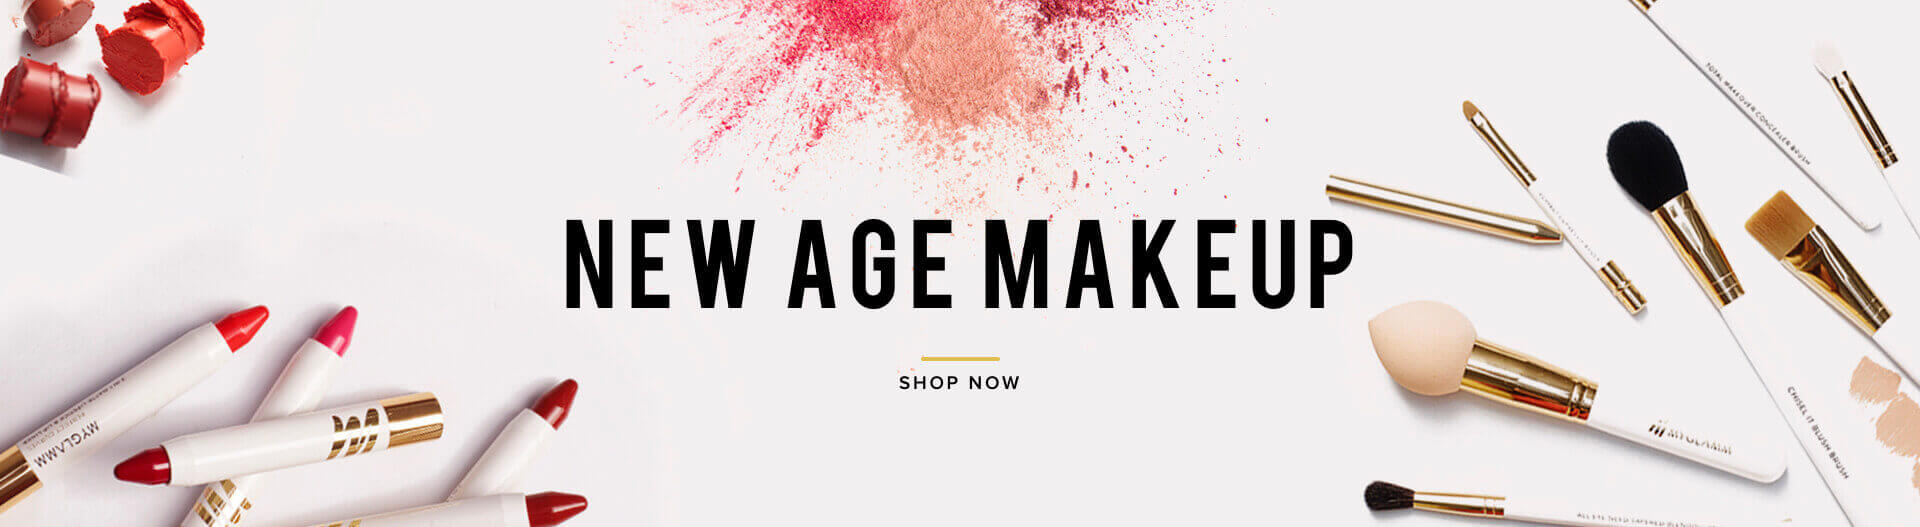 Myglamm-newage-makeup.jpg